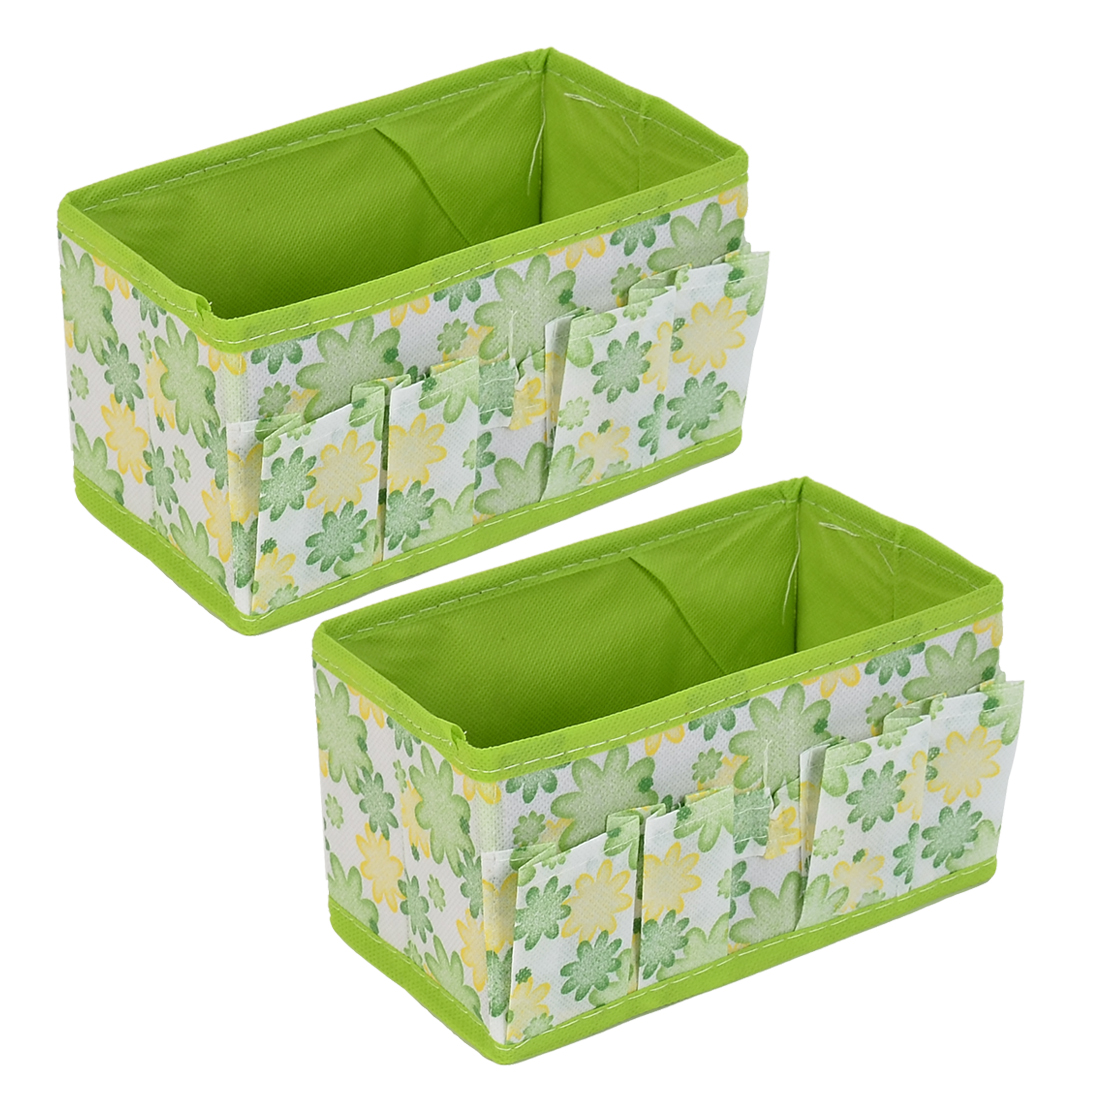 Women Cosmetic Jewelry Foldable Floral Pattern Storage Box Case Green 2pcs